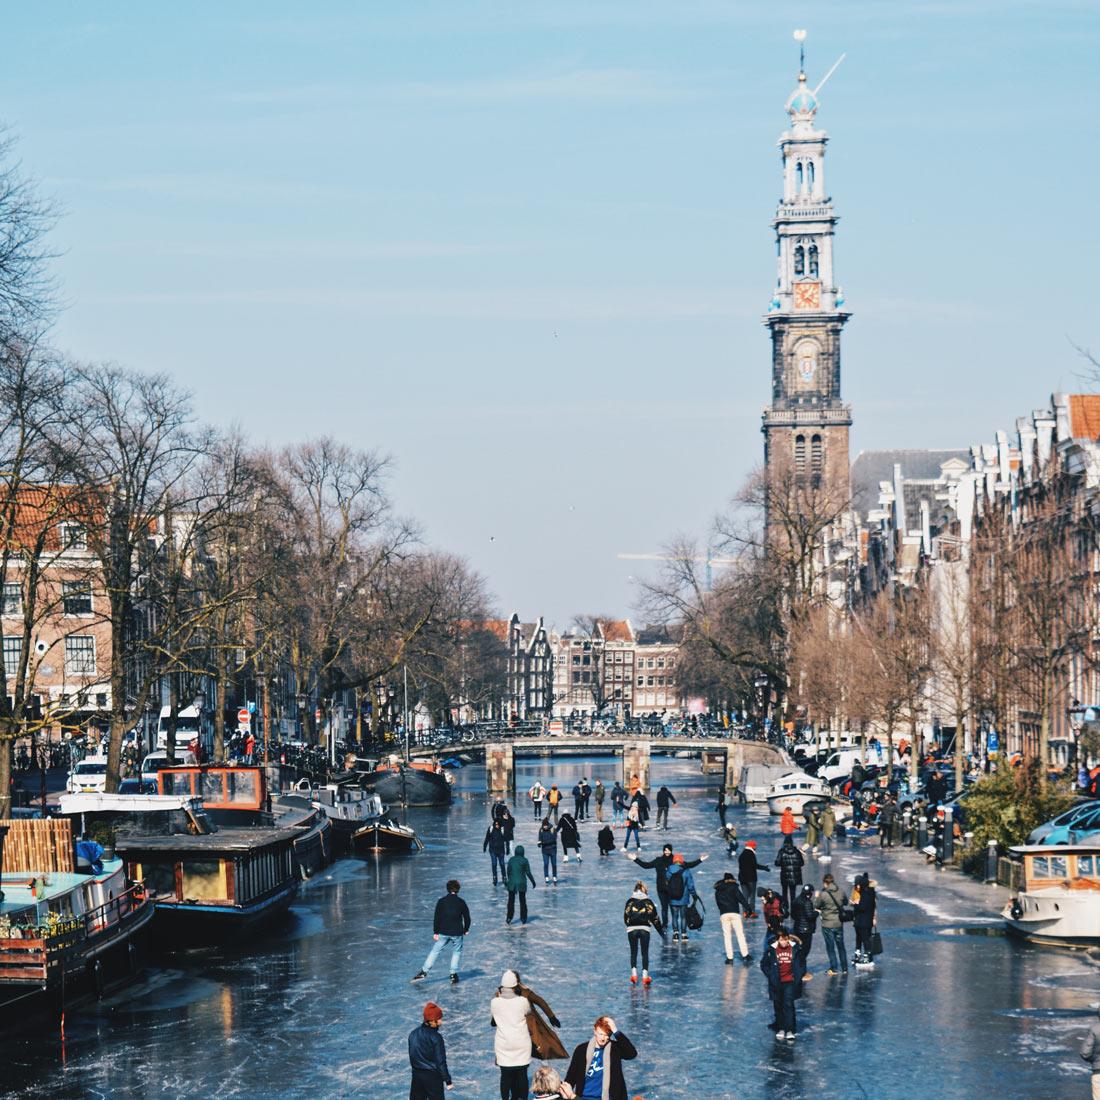 Winter on Amsterdam's frozen canals Frozen Prinsengracht with Westertoren   Amsterdam Frozen Canals © Coupleofmen.com